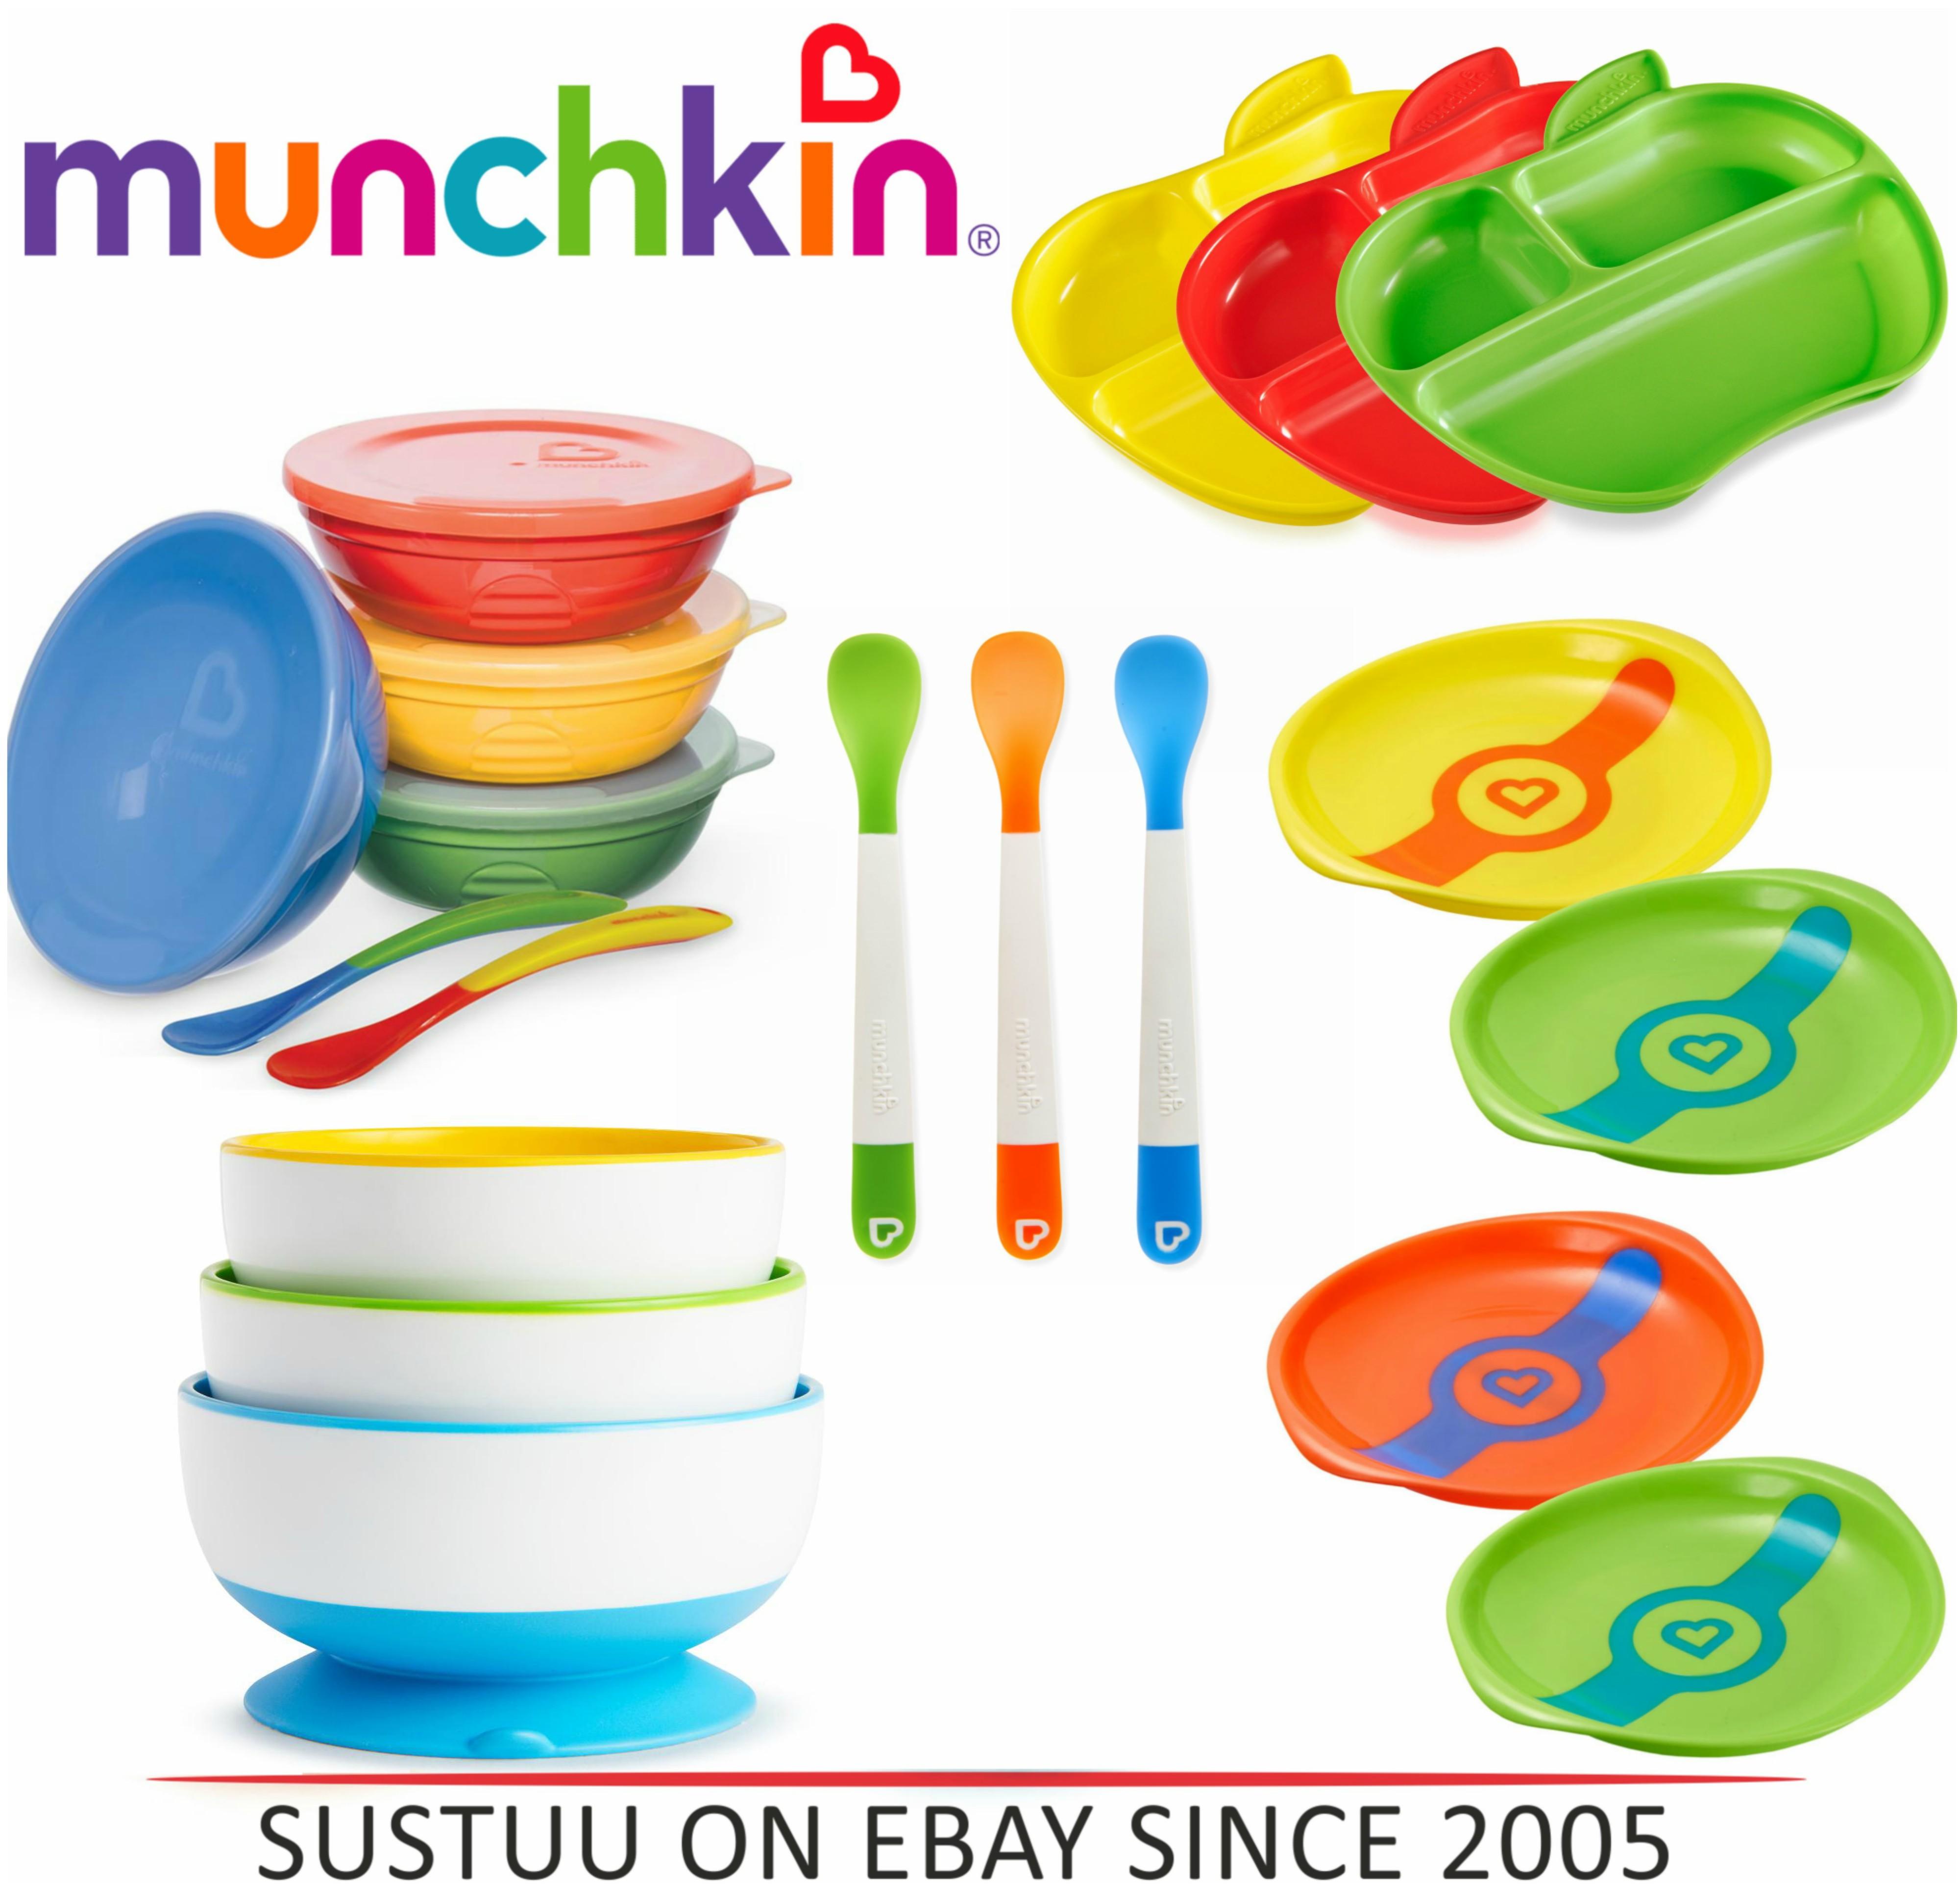 Munchkin Self-Feeding Toddler Bowls/ Heat Sensor Plates/ Feeding Spoon